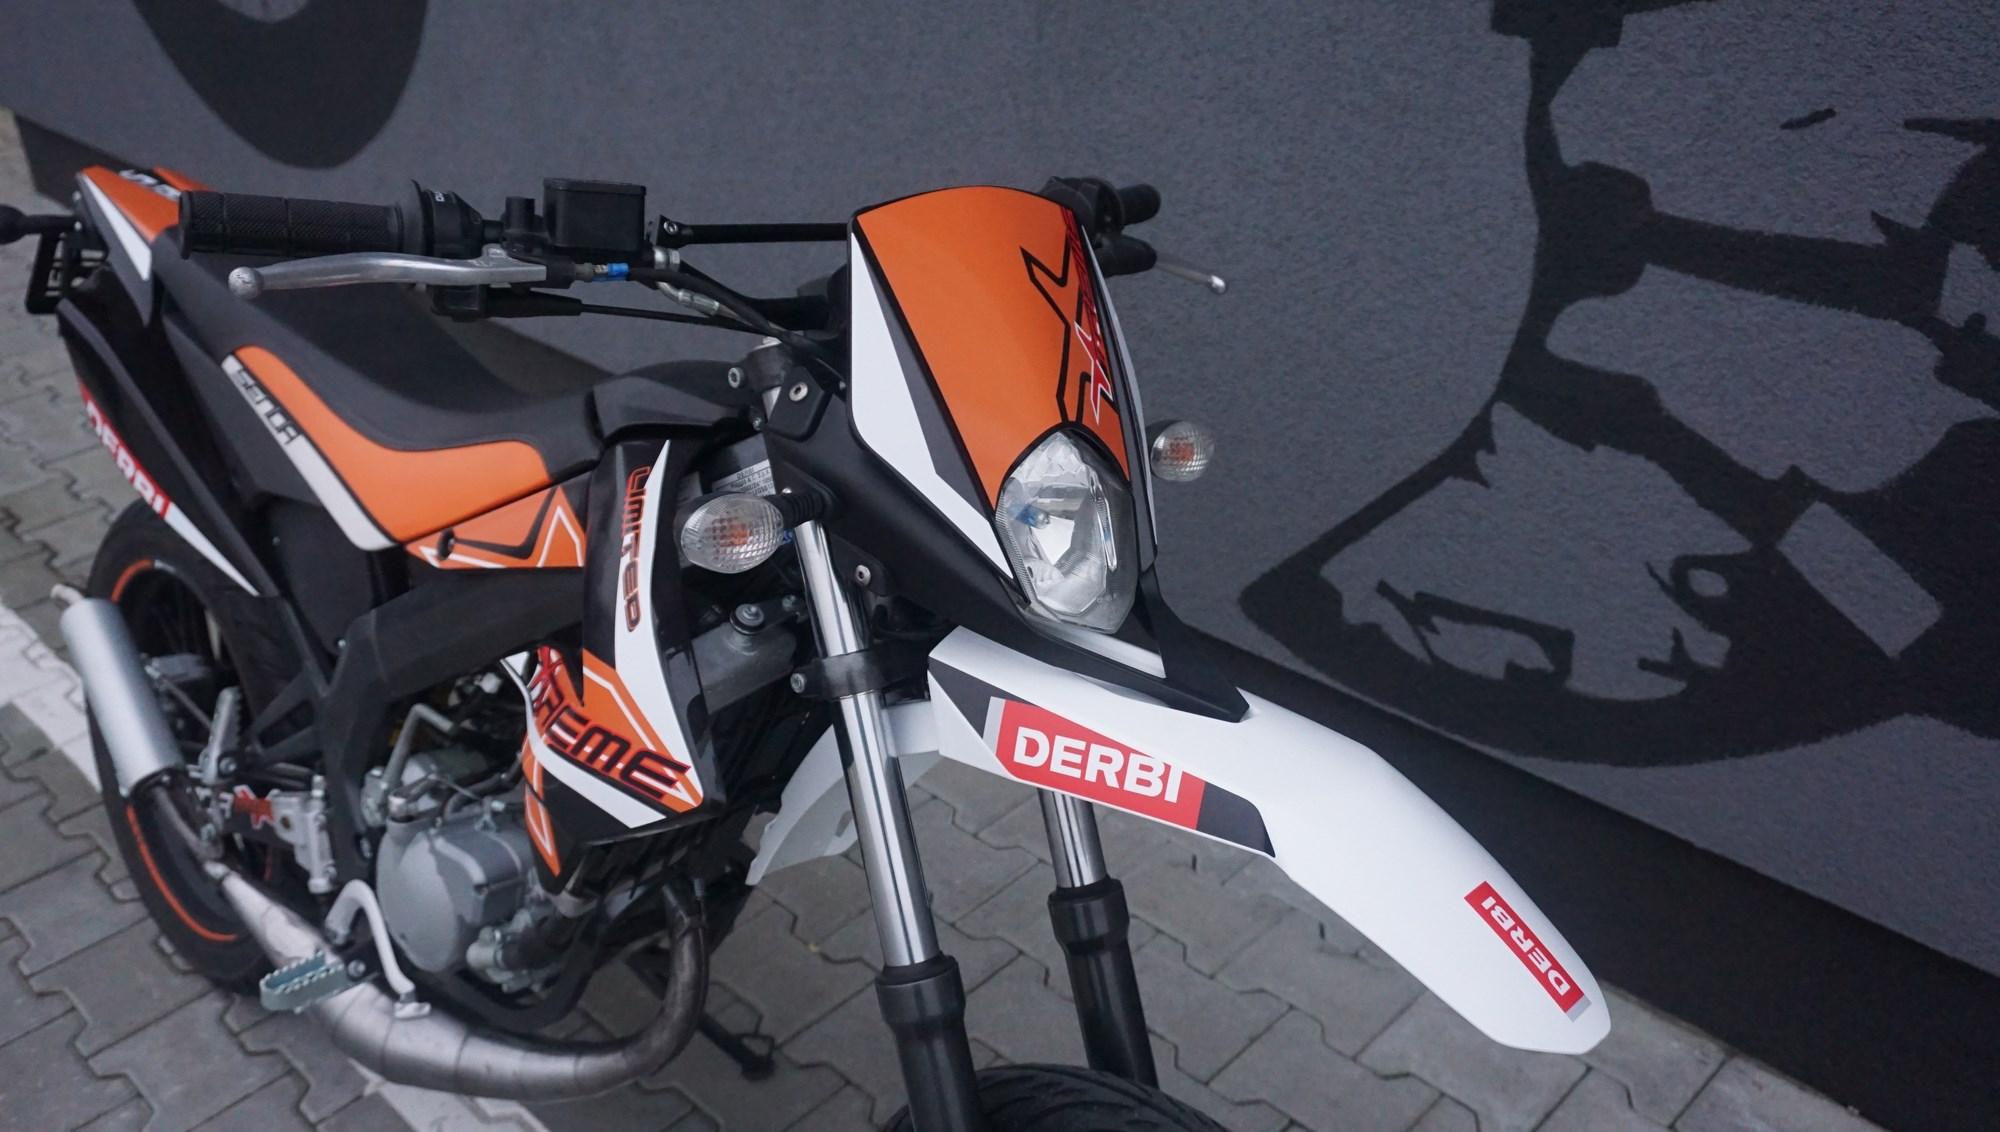 DERBi Senda DRD 50